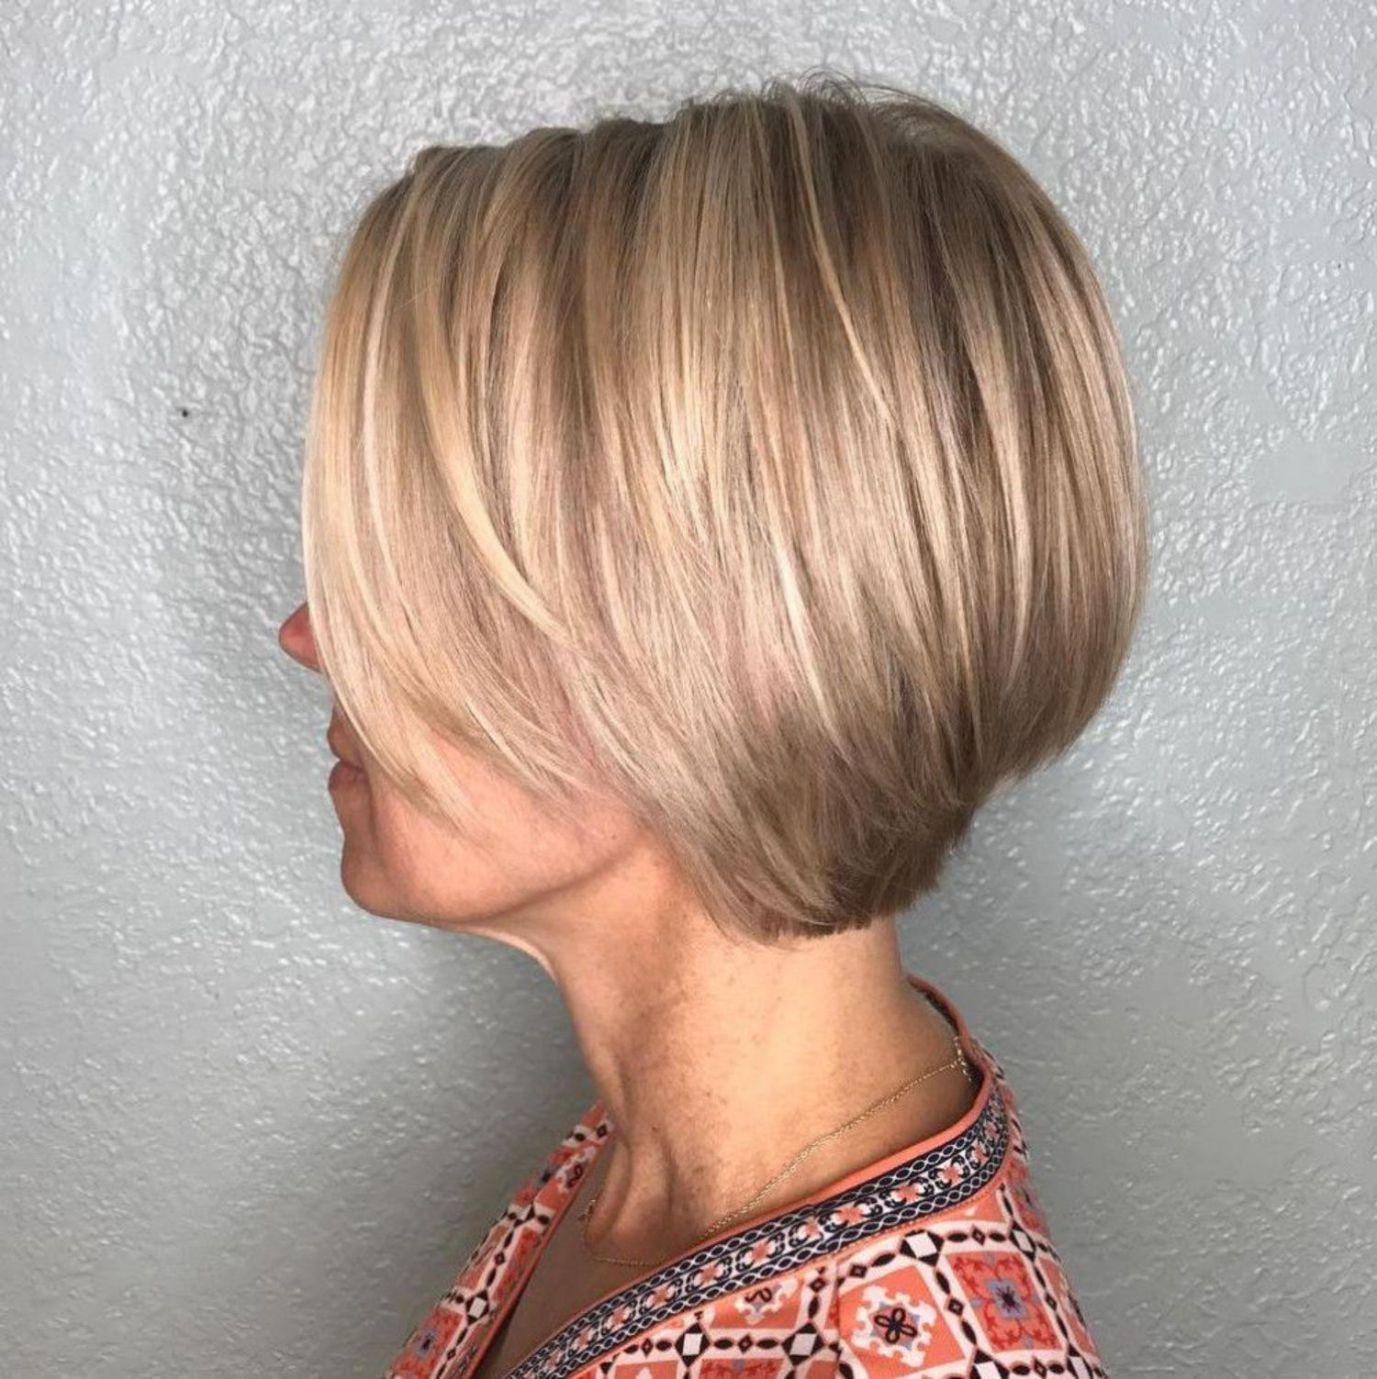 Stacked Blonde Bob For Fine Hair Bob Hairstyles For Fine Hair Modern Hairstyles Haircuts For Fine Hair